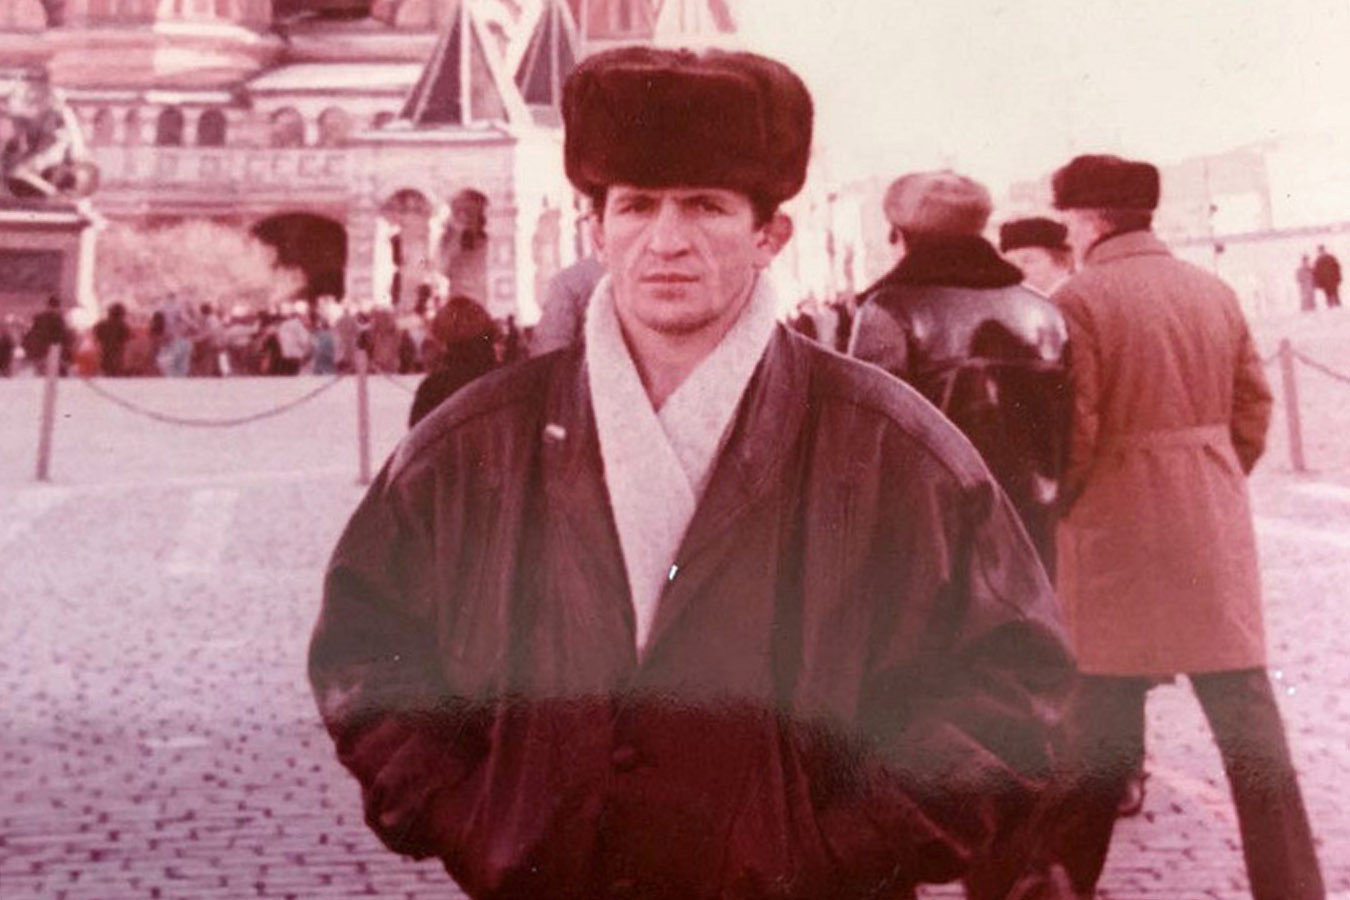 Абдулманап Нурмагомедов в молодости